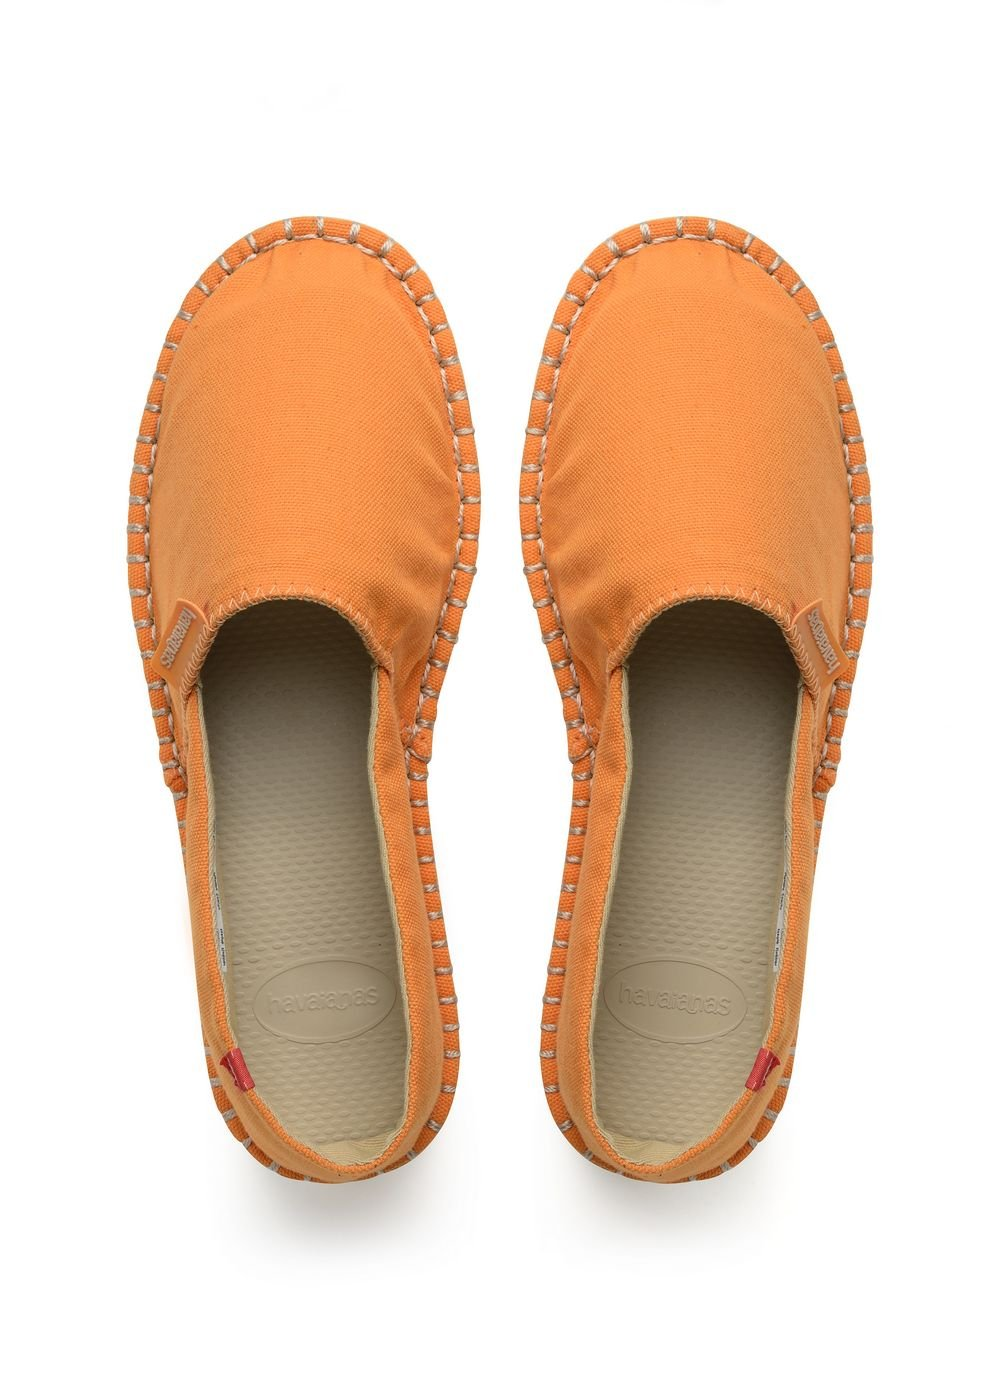 Havaianas - 4137014 - - Espadrilles - Mixte Adulte - Orange) Multicolore Orange (Light Orange) c52a99c - piero.space